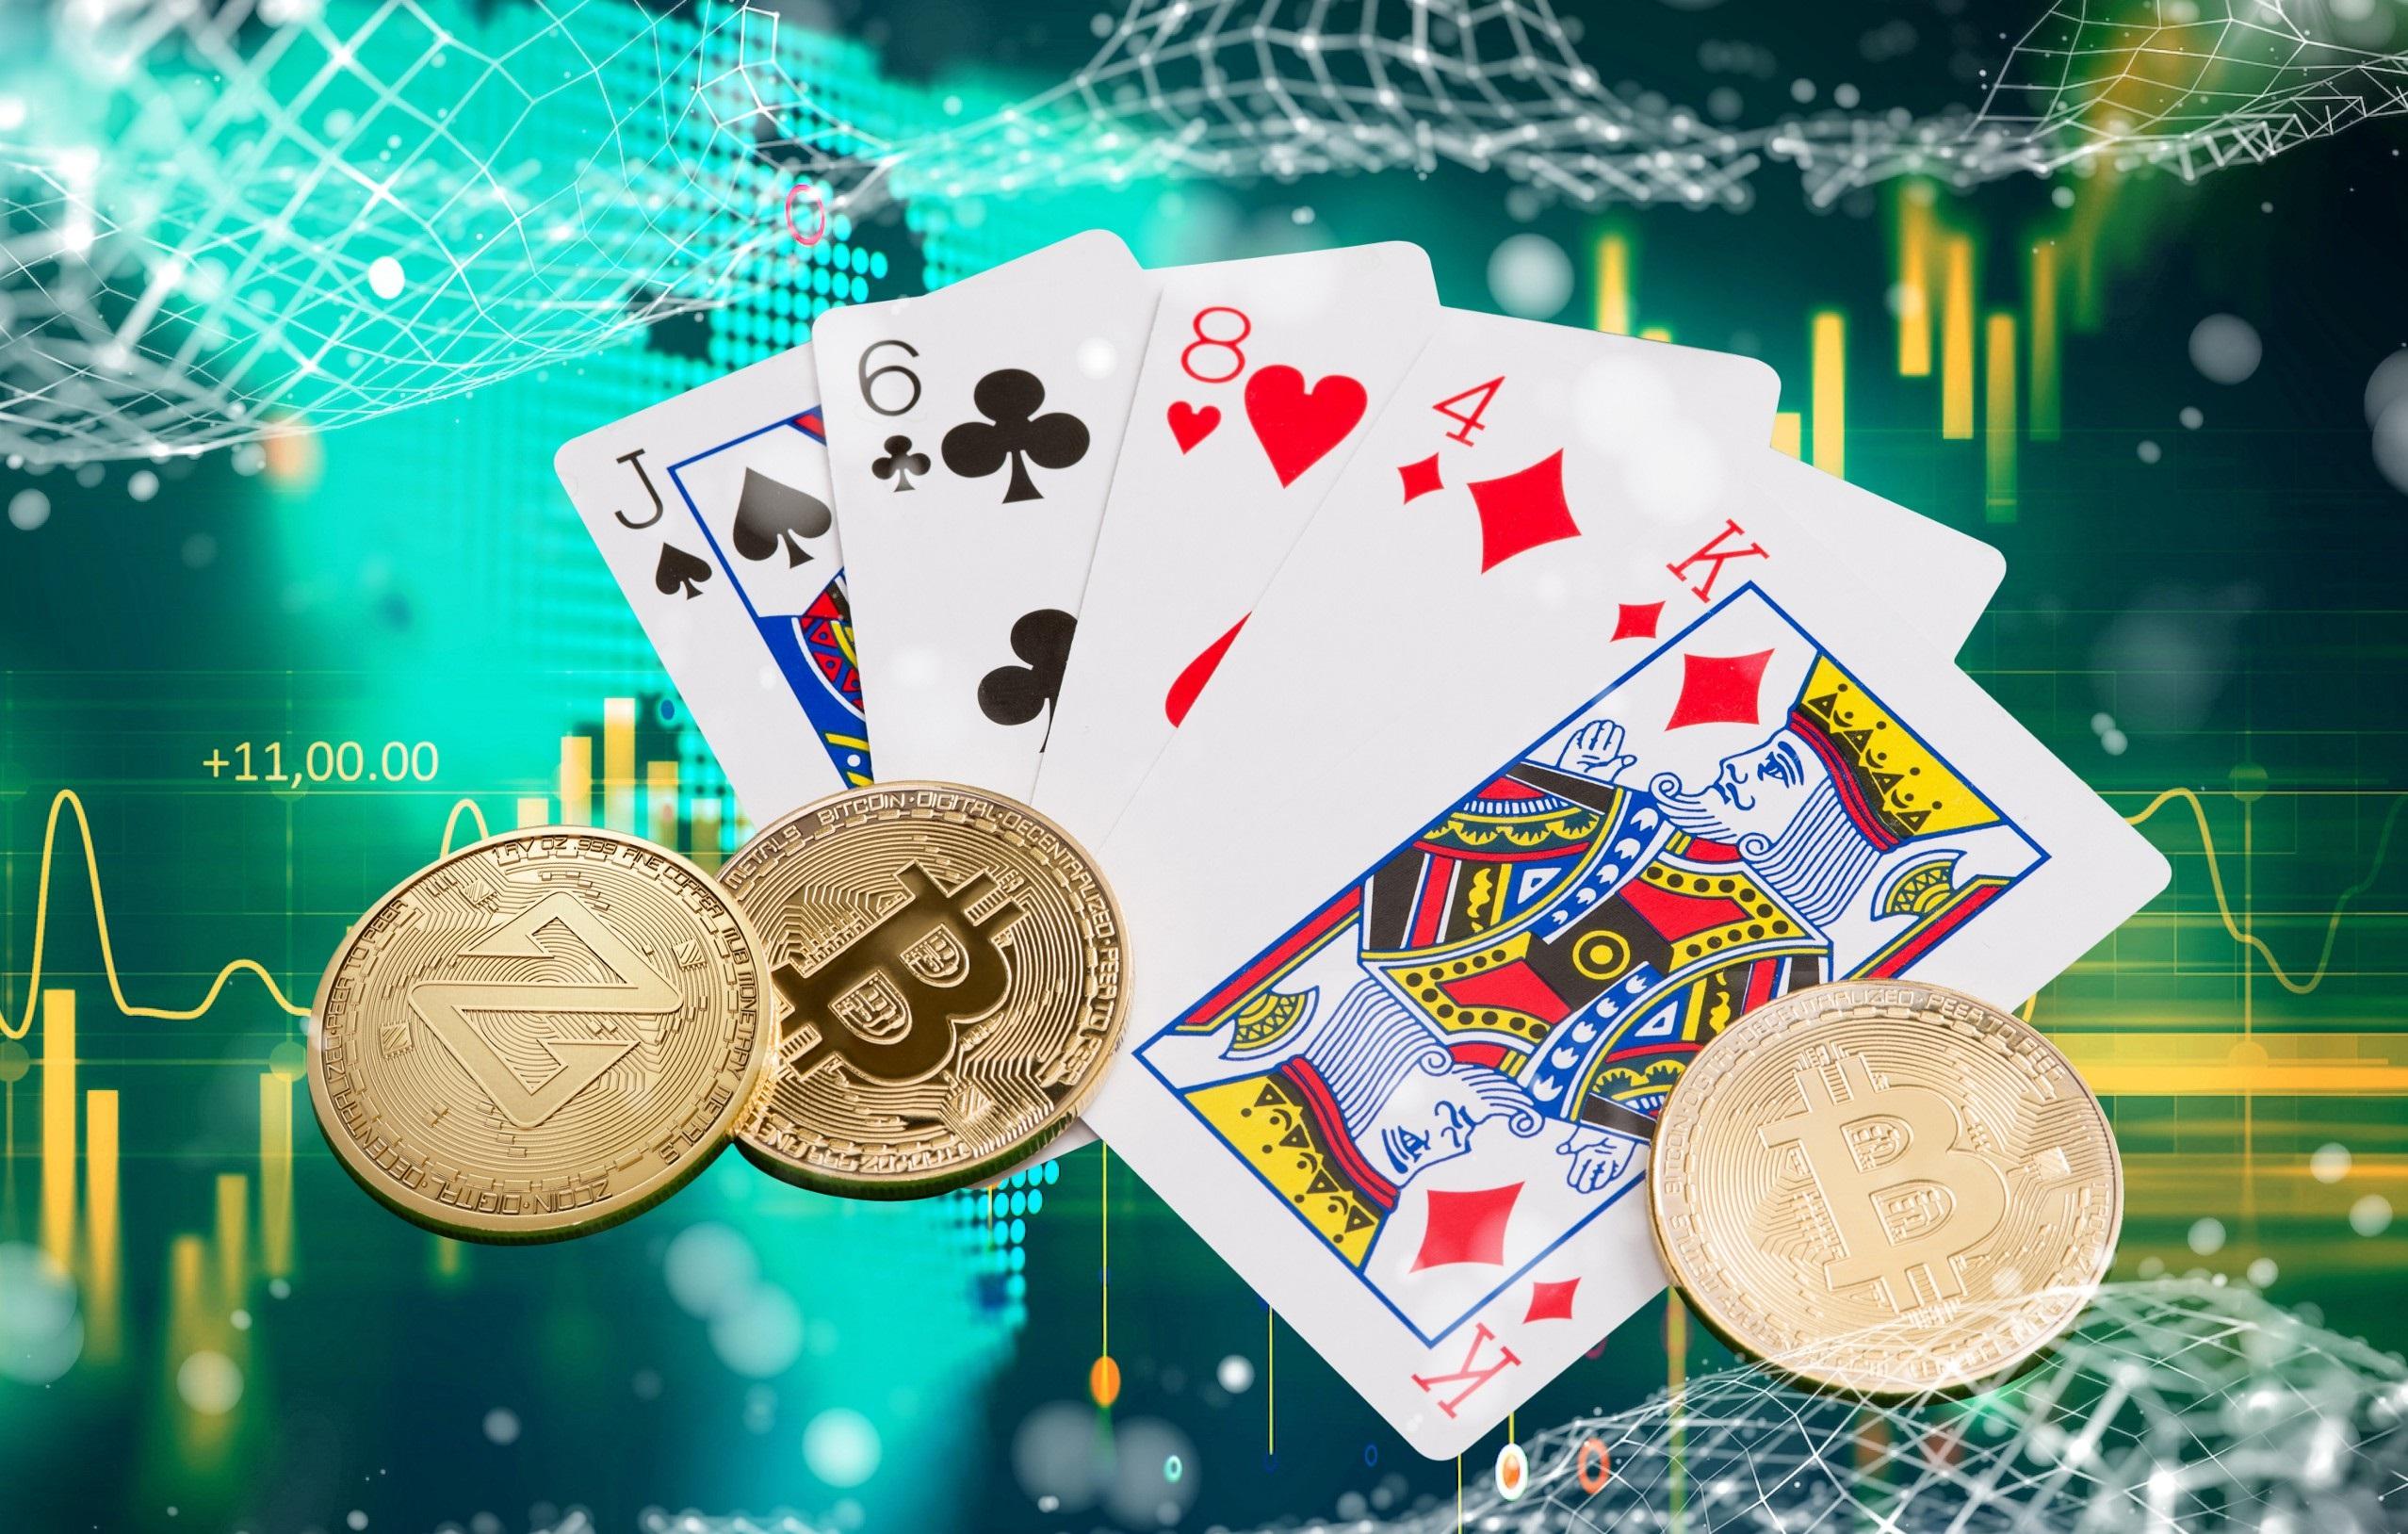 30 permanent DA 58-30+ PBN Backlinks Casino,  Gambling,  Poker,  Judi Related Websites